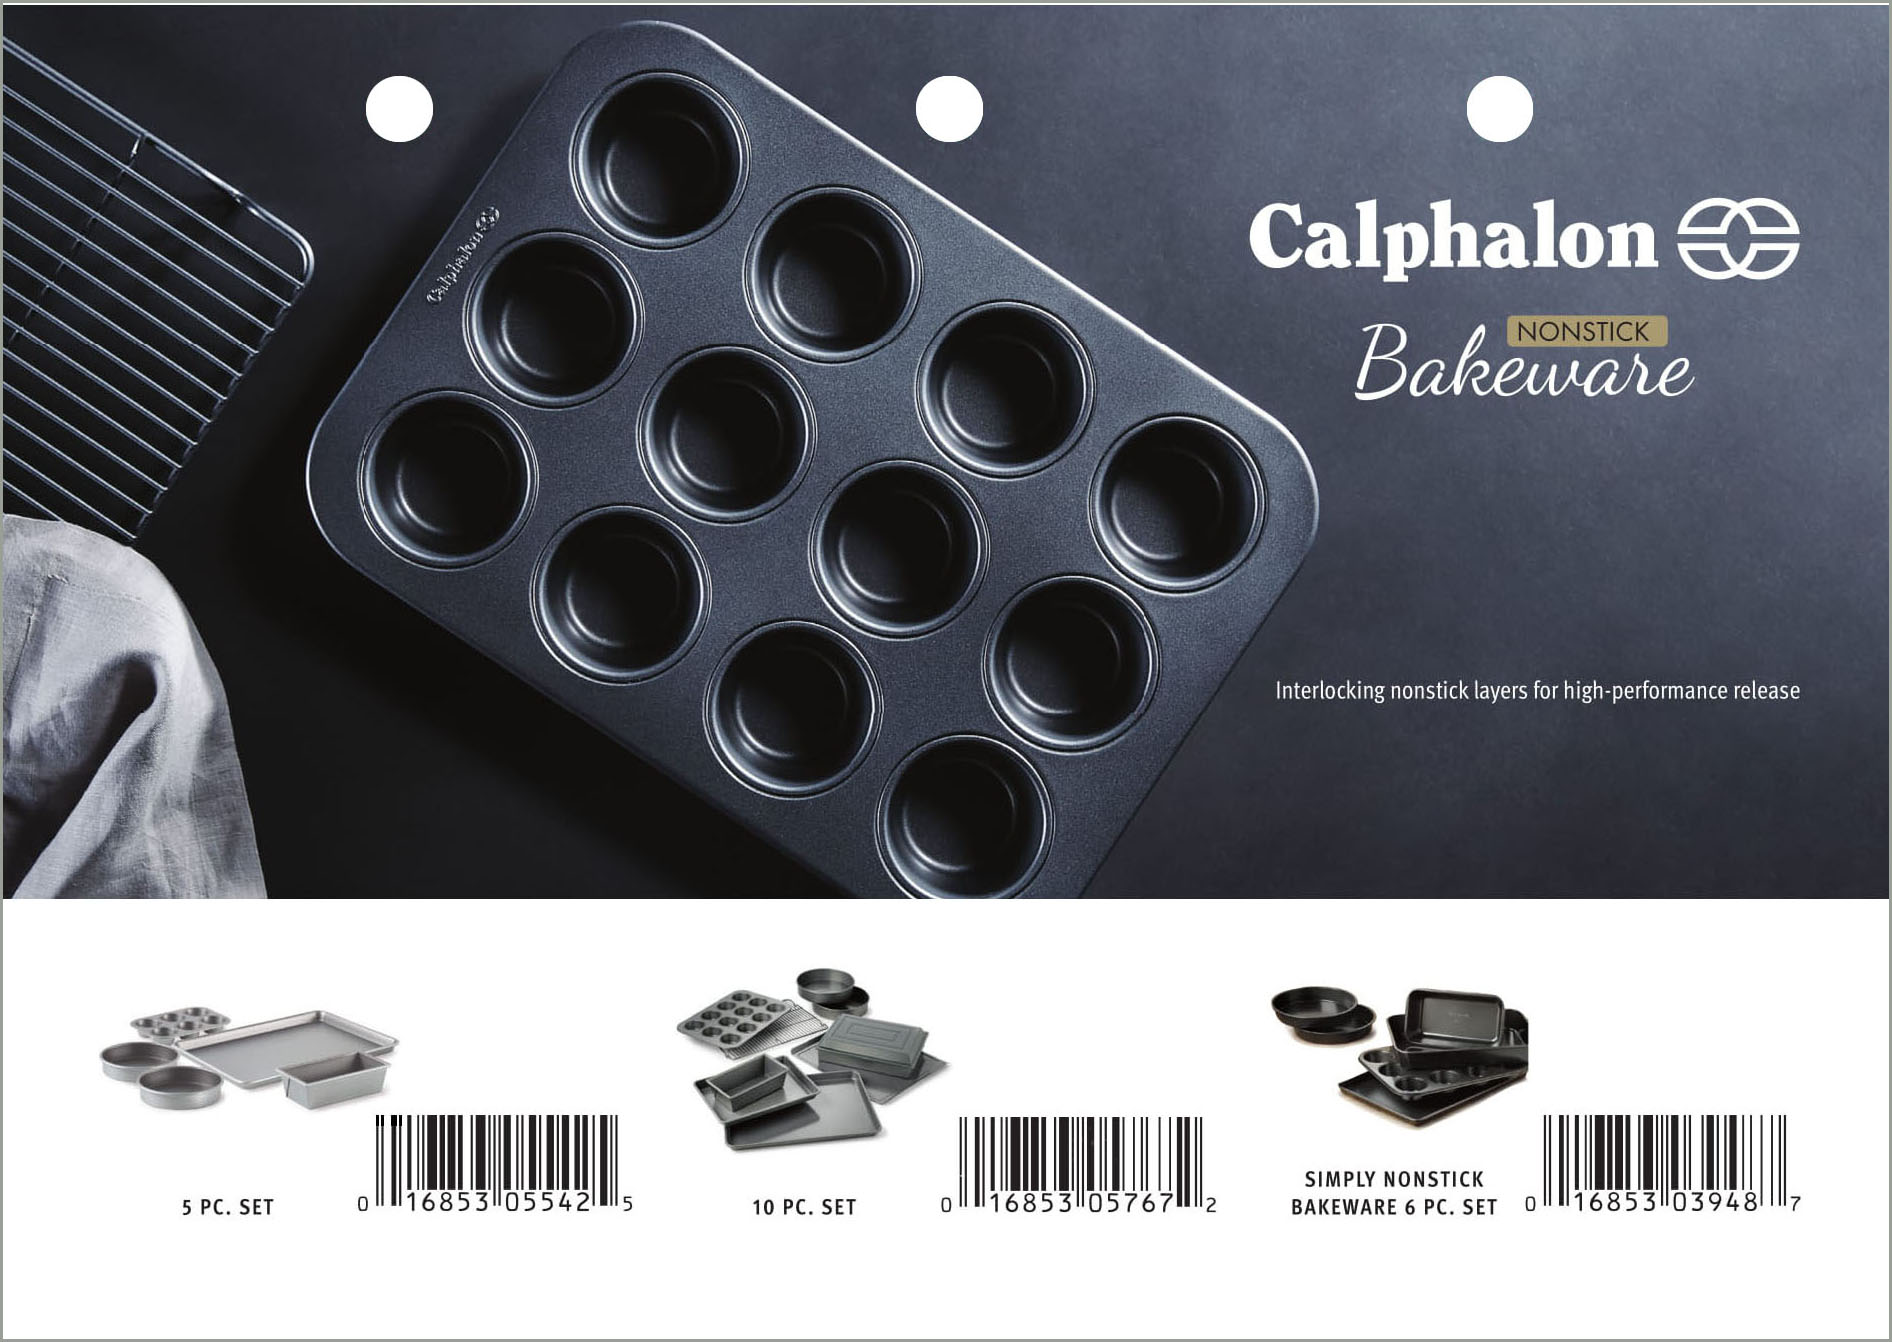 Calphalon_Flipbook_Pages_0000s_0010_75783_Calphalon_Macys_FlipBook_R6_M_0008_75783_Calphalon_Macys_FlipBook_R6_M_PDFX1A-.jpg